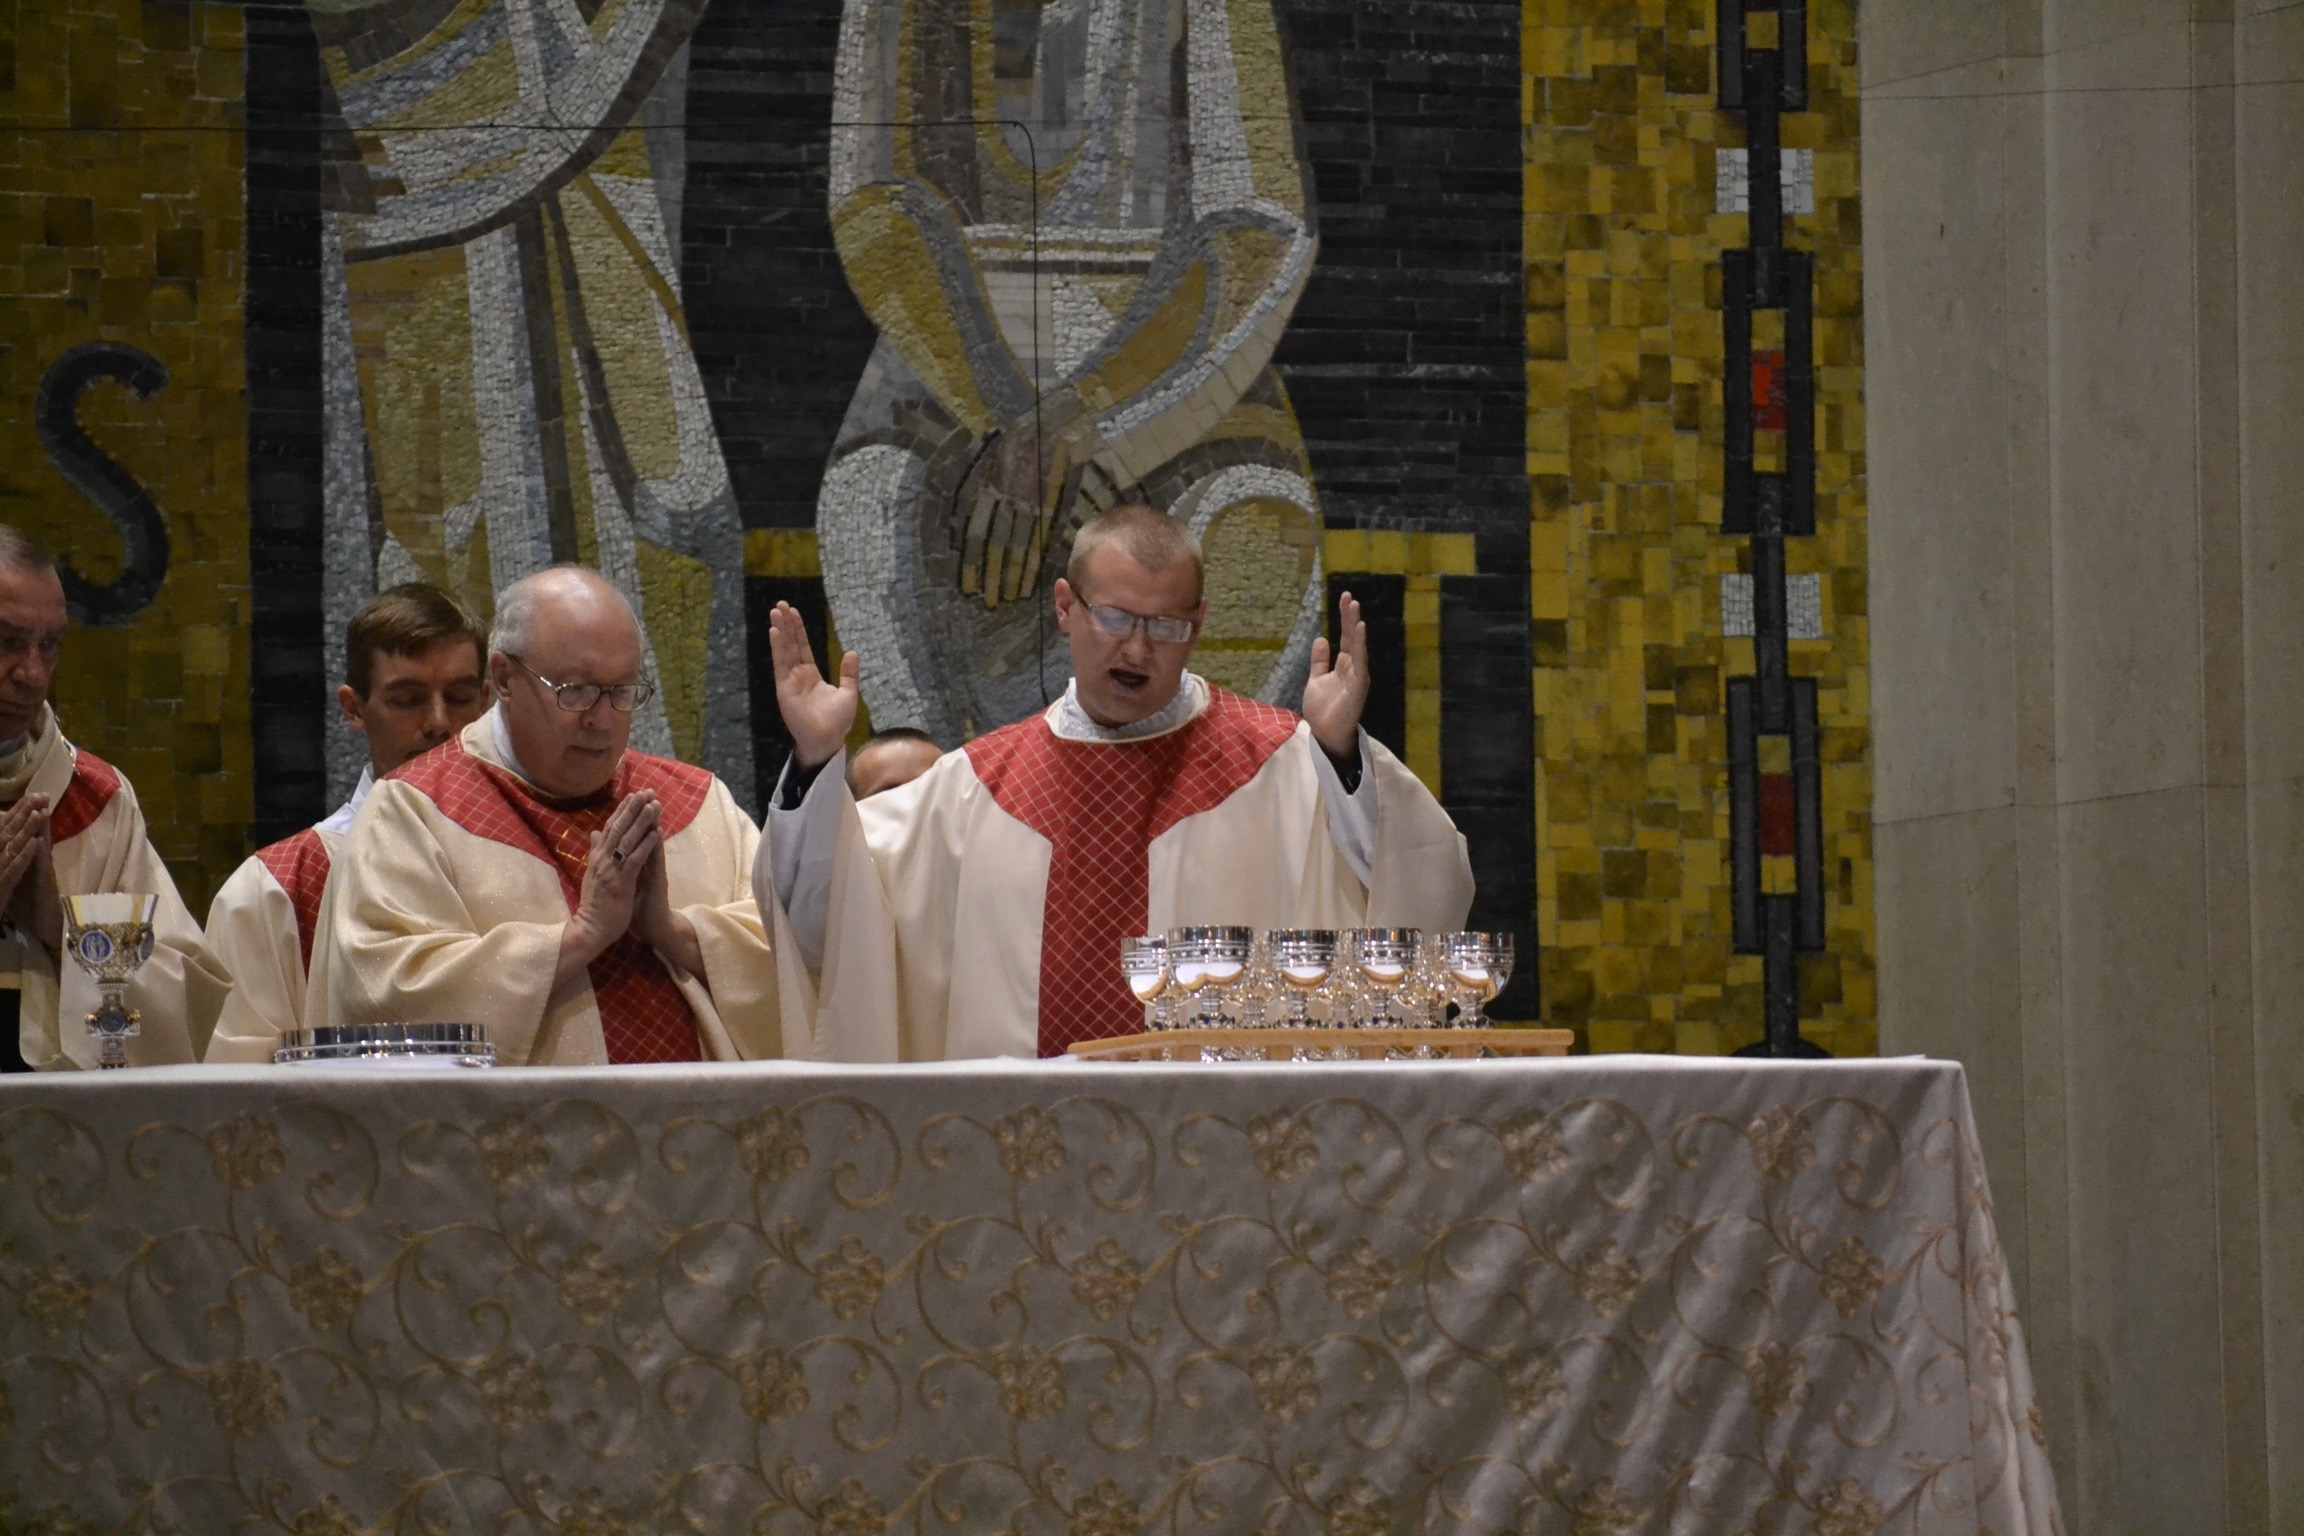 Reverend David Doseck Eucharistic Prayer (CT Photo/Greg Hartman)